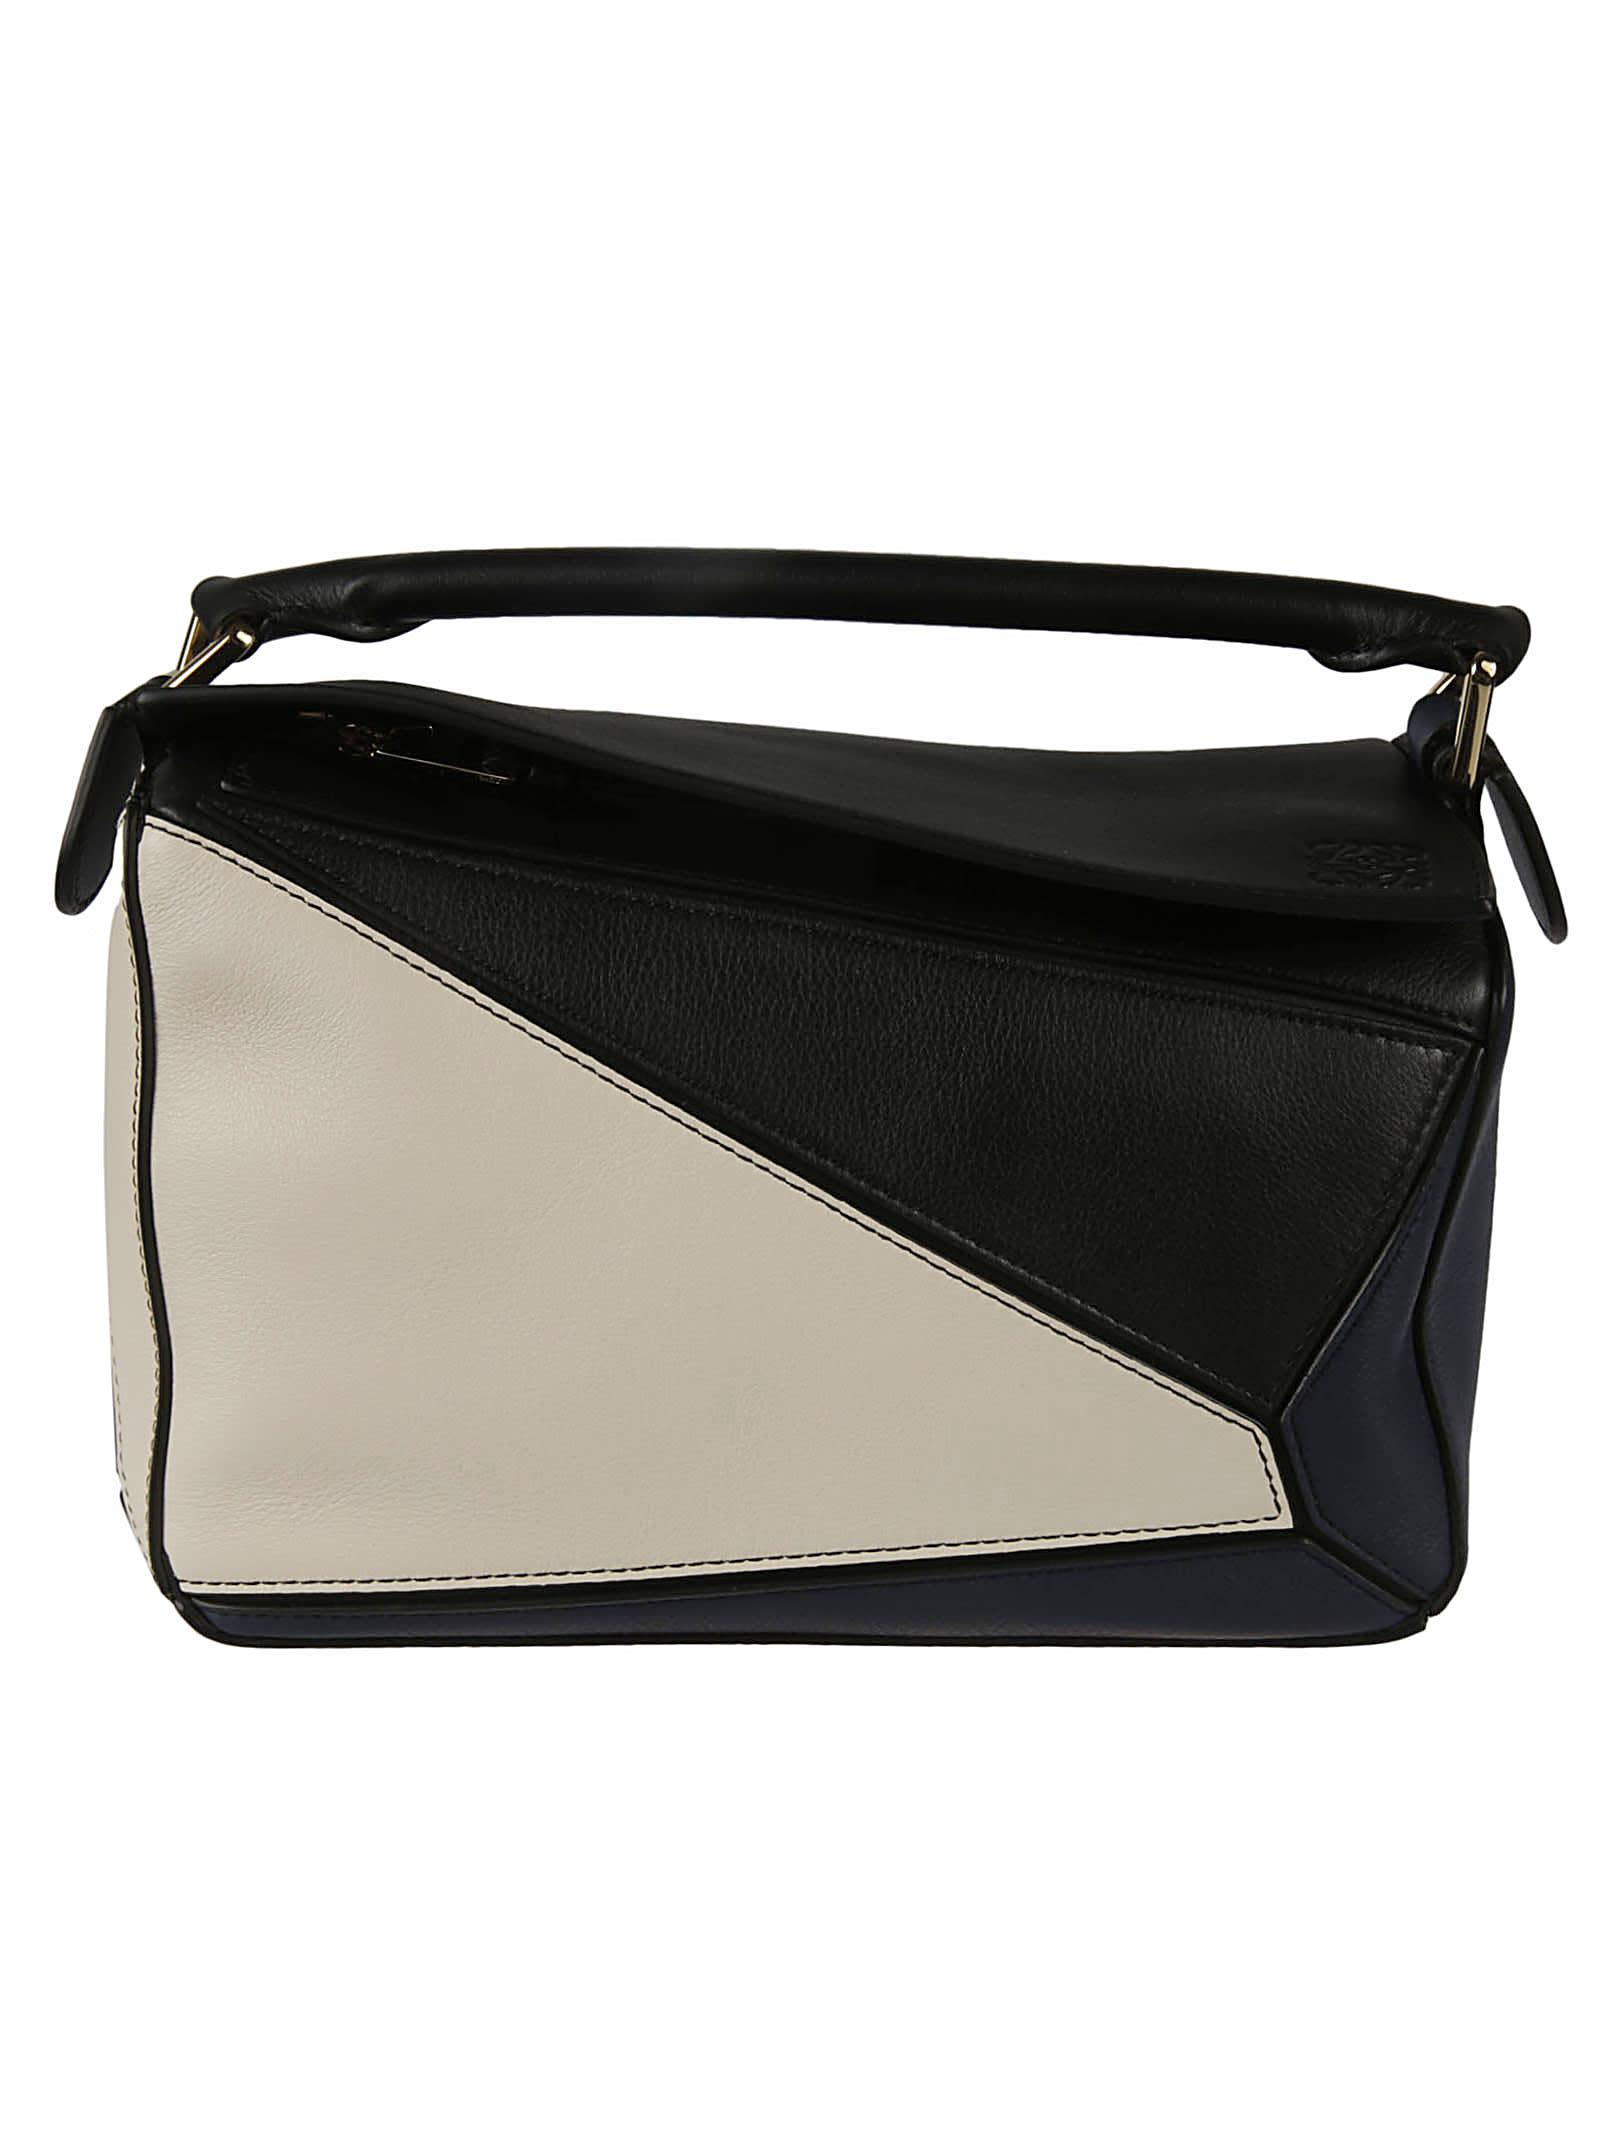 Loewe Puzzle Small Shoulder Bag